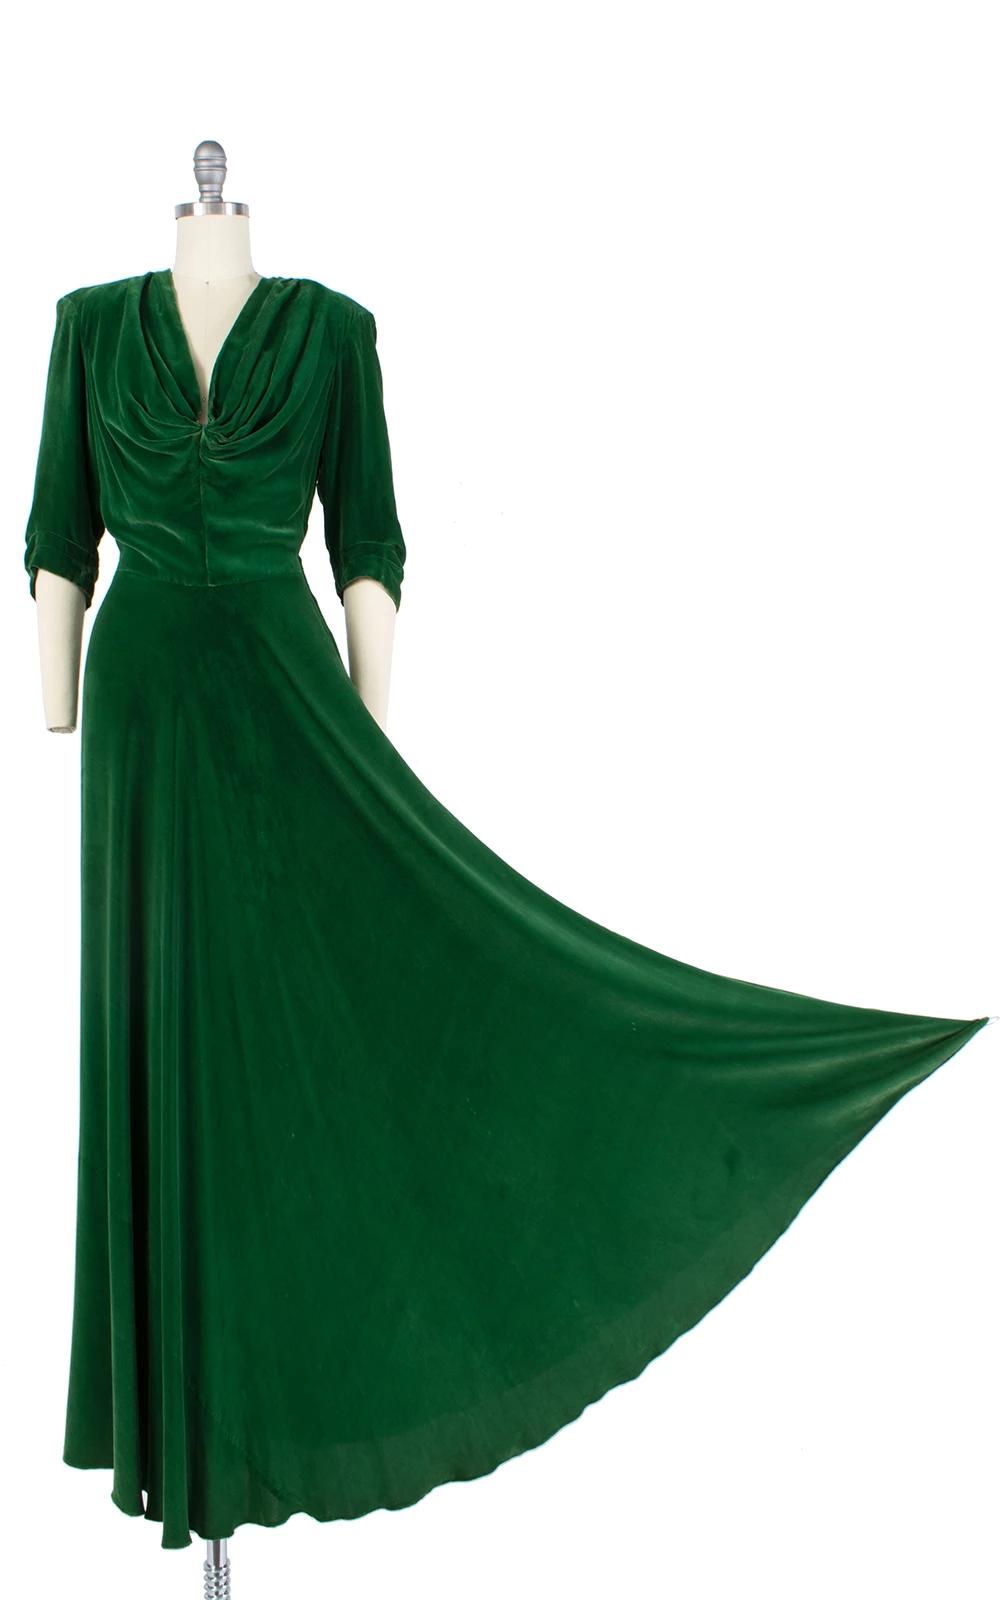 Pin On 1940s Women S Fashion Vintage Style Inspiration [ 1600 x 1000 Pixel ]